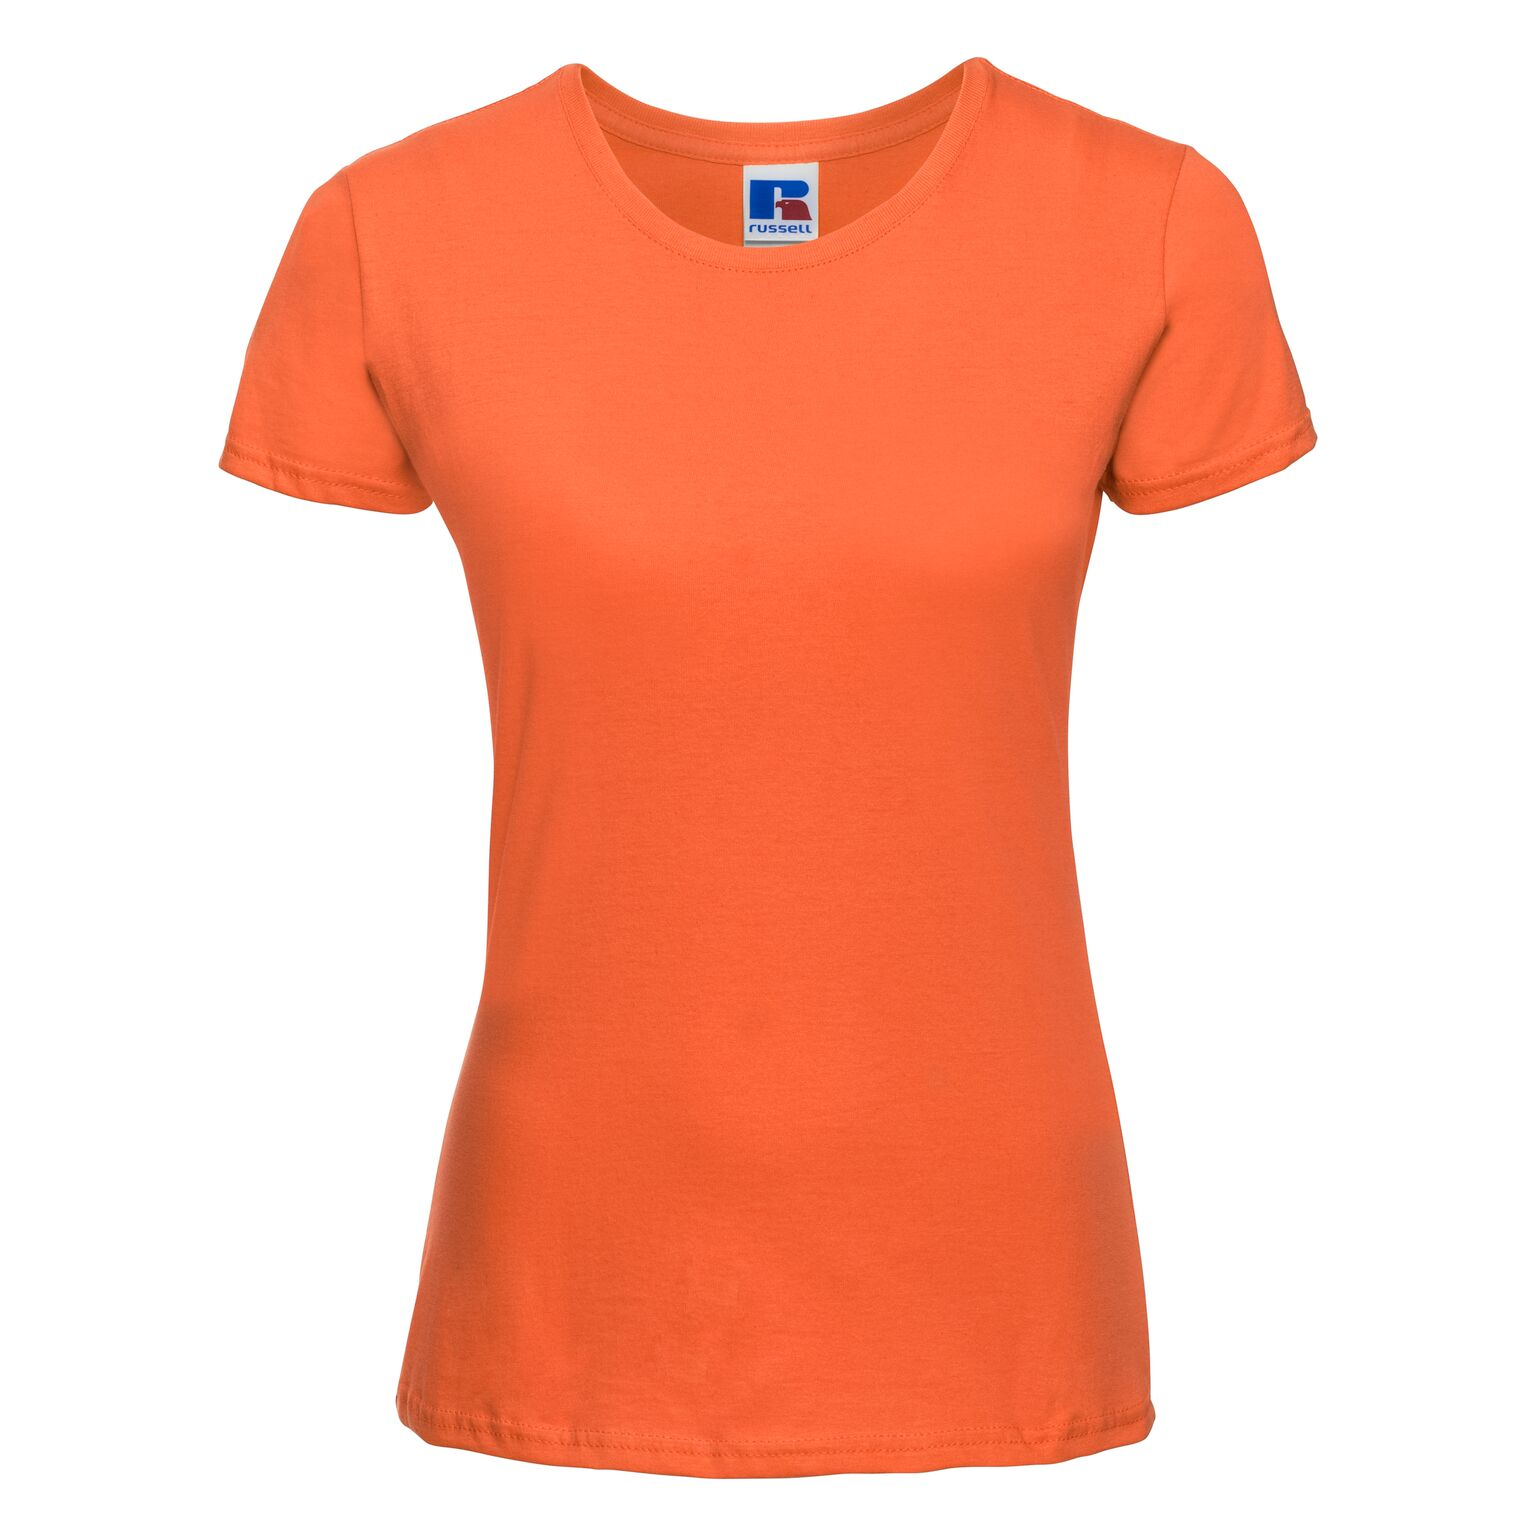 01_j155f_orange--0-0--76231bdb-4e16-4525-9cf5-0079dbab64ca